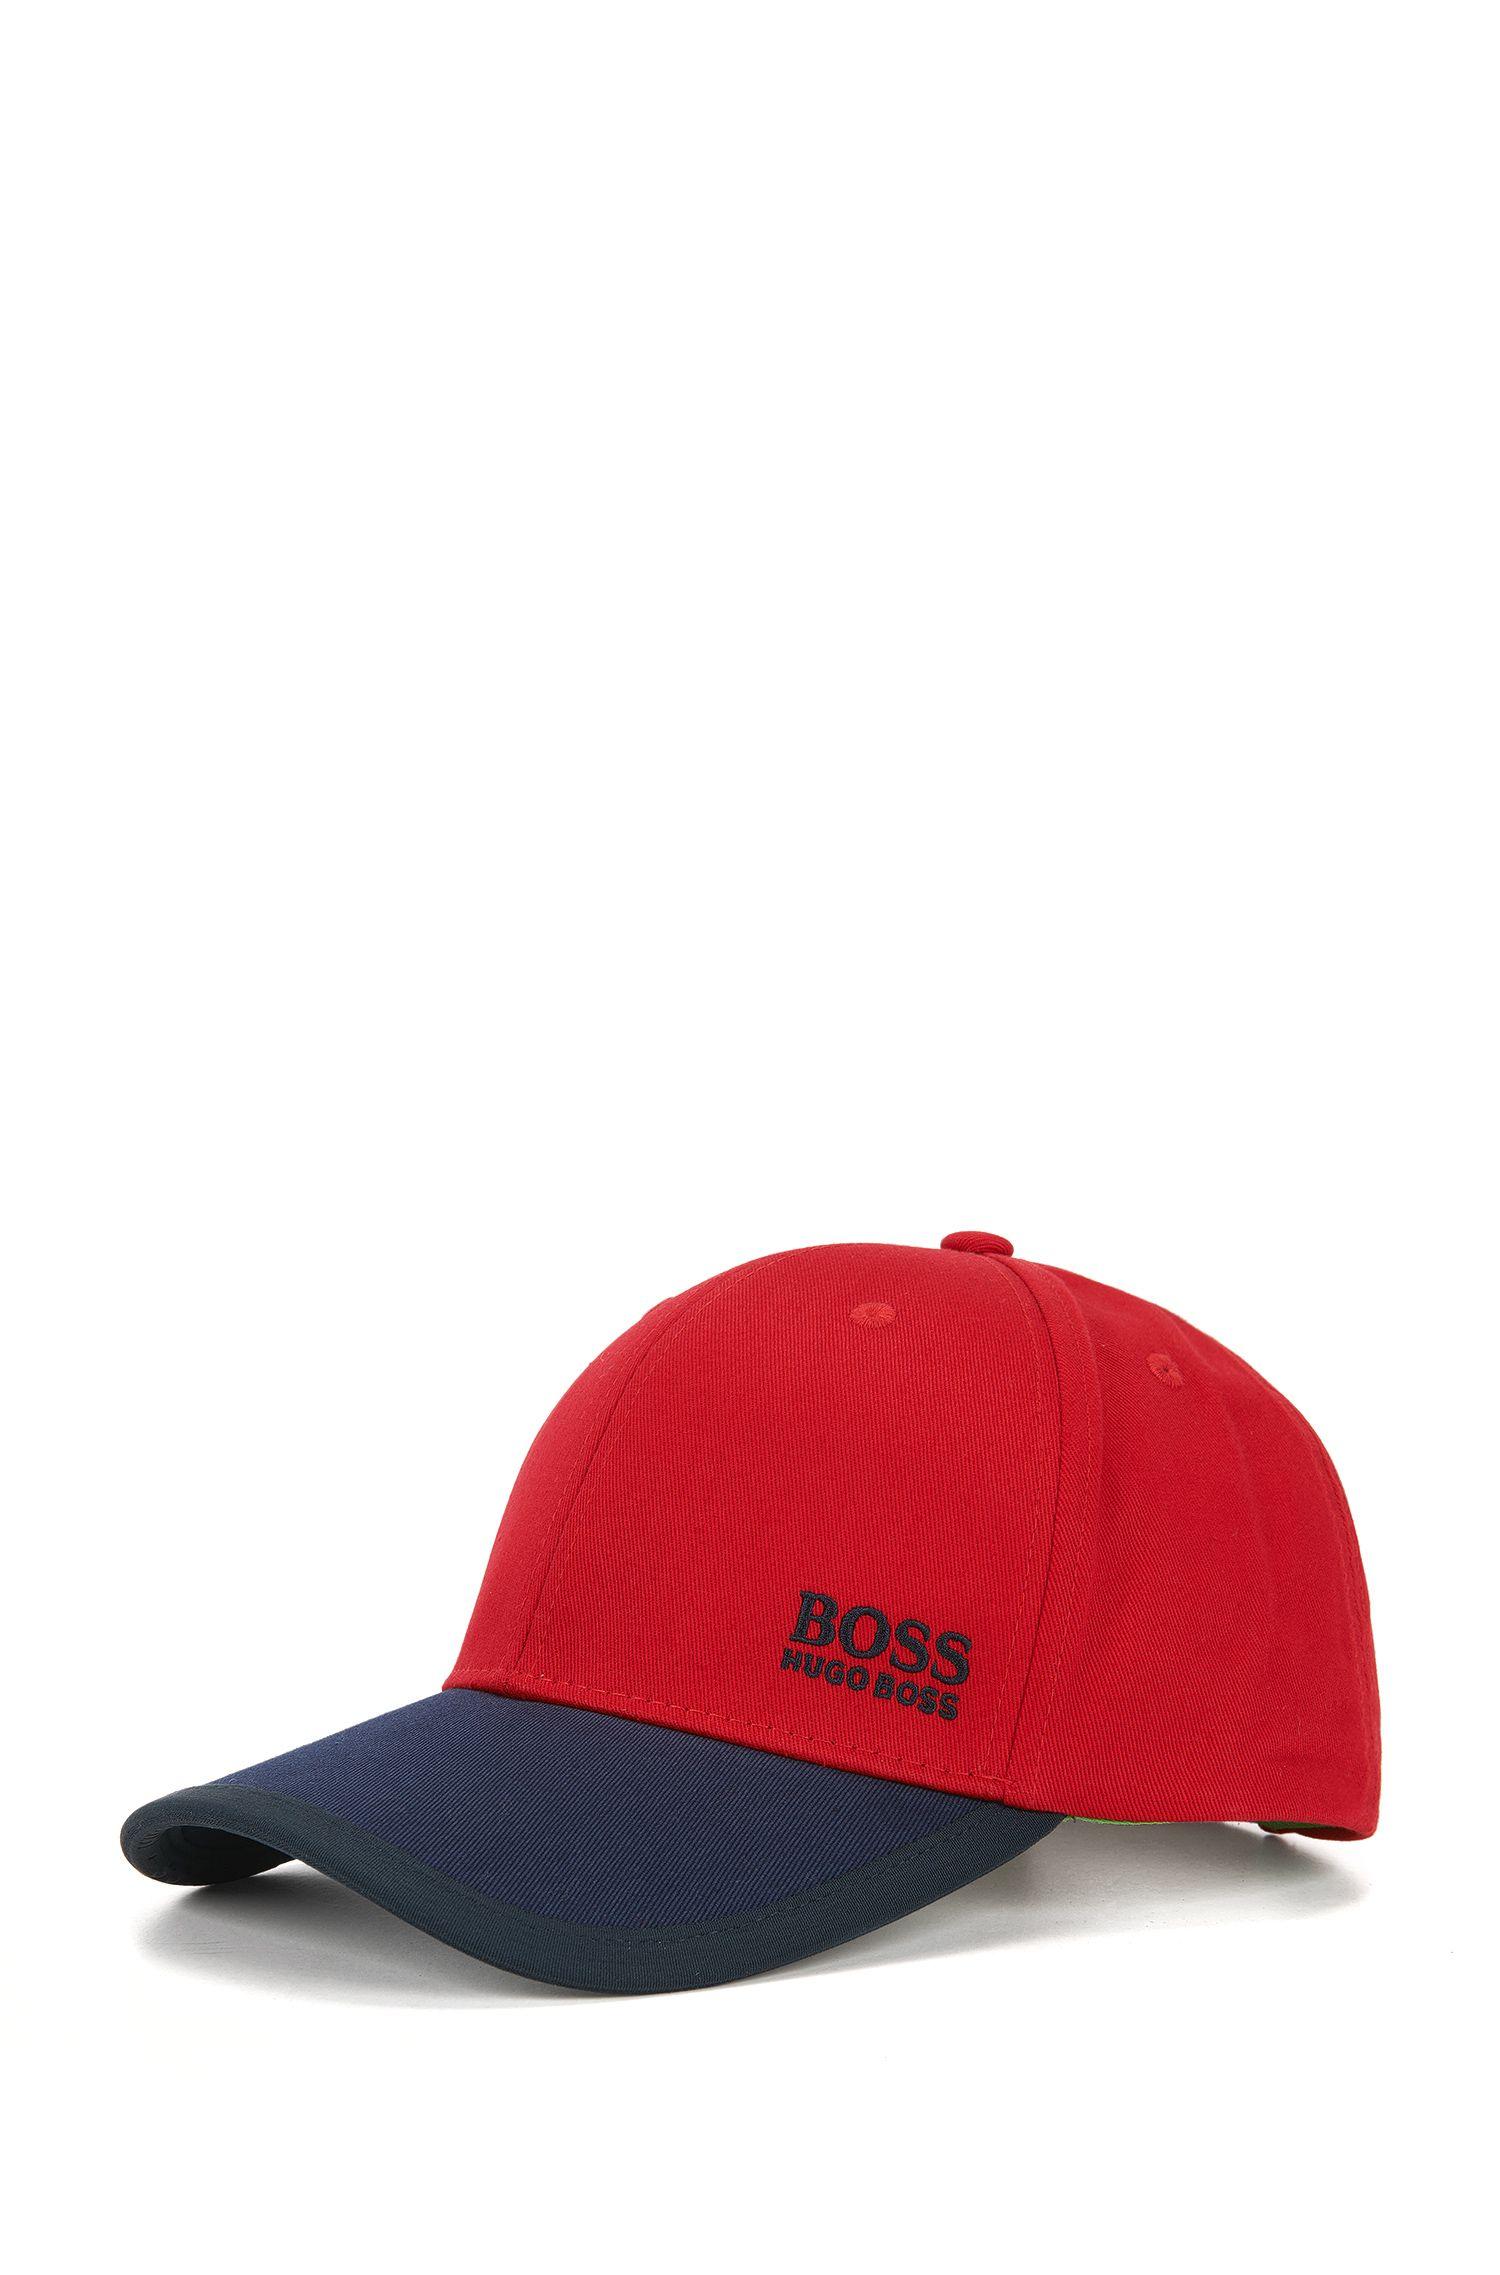 Baseball Cap aus Baumwolle im Colour-Block-Design